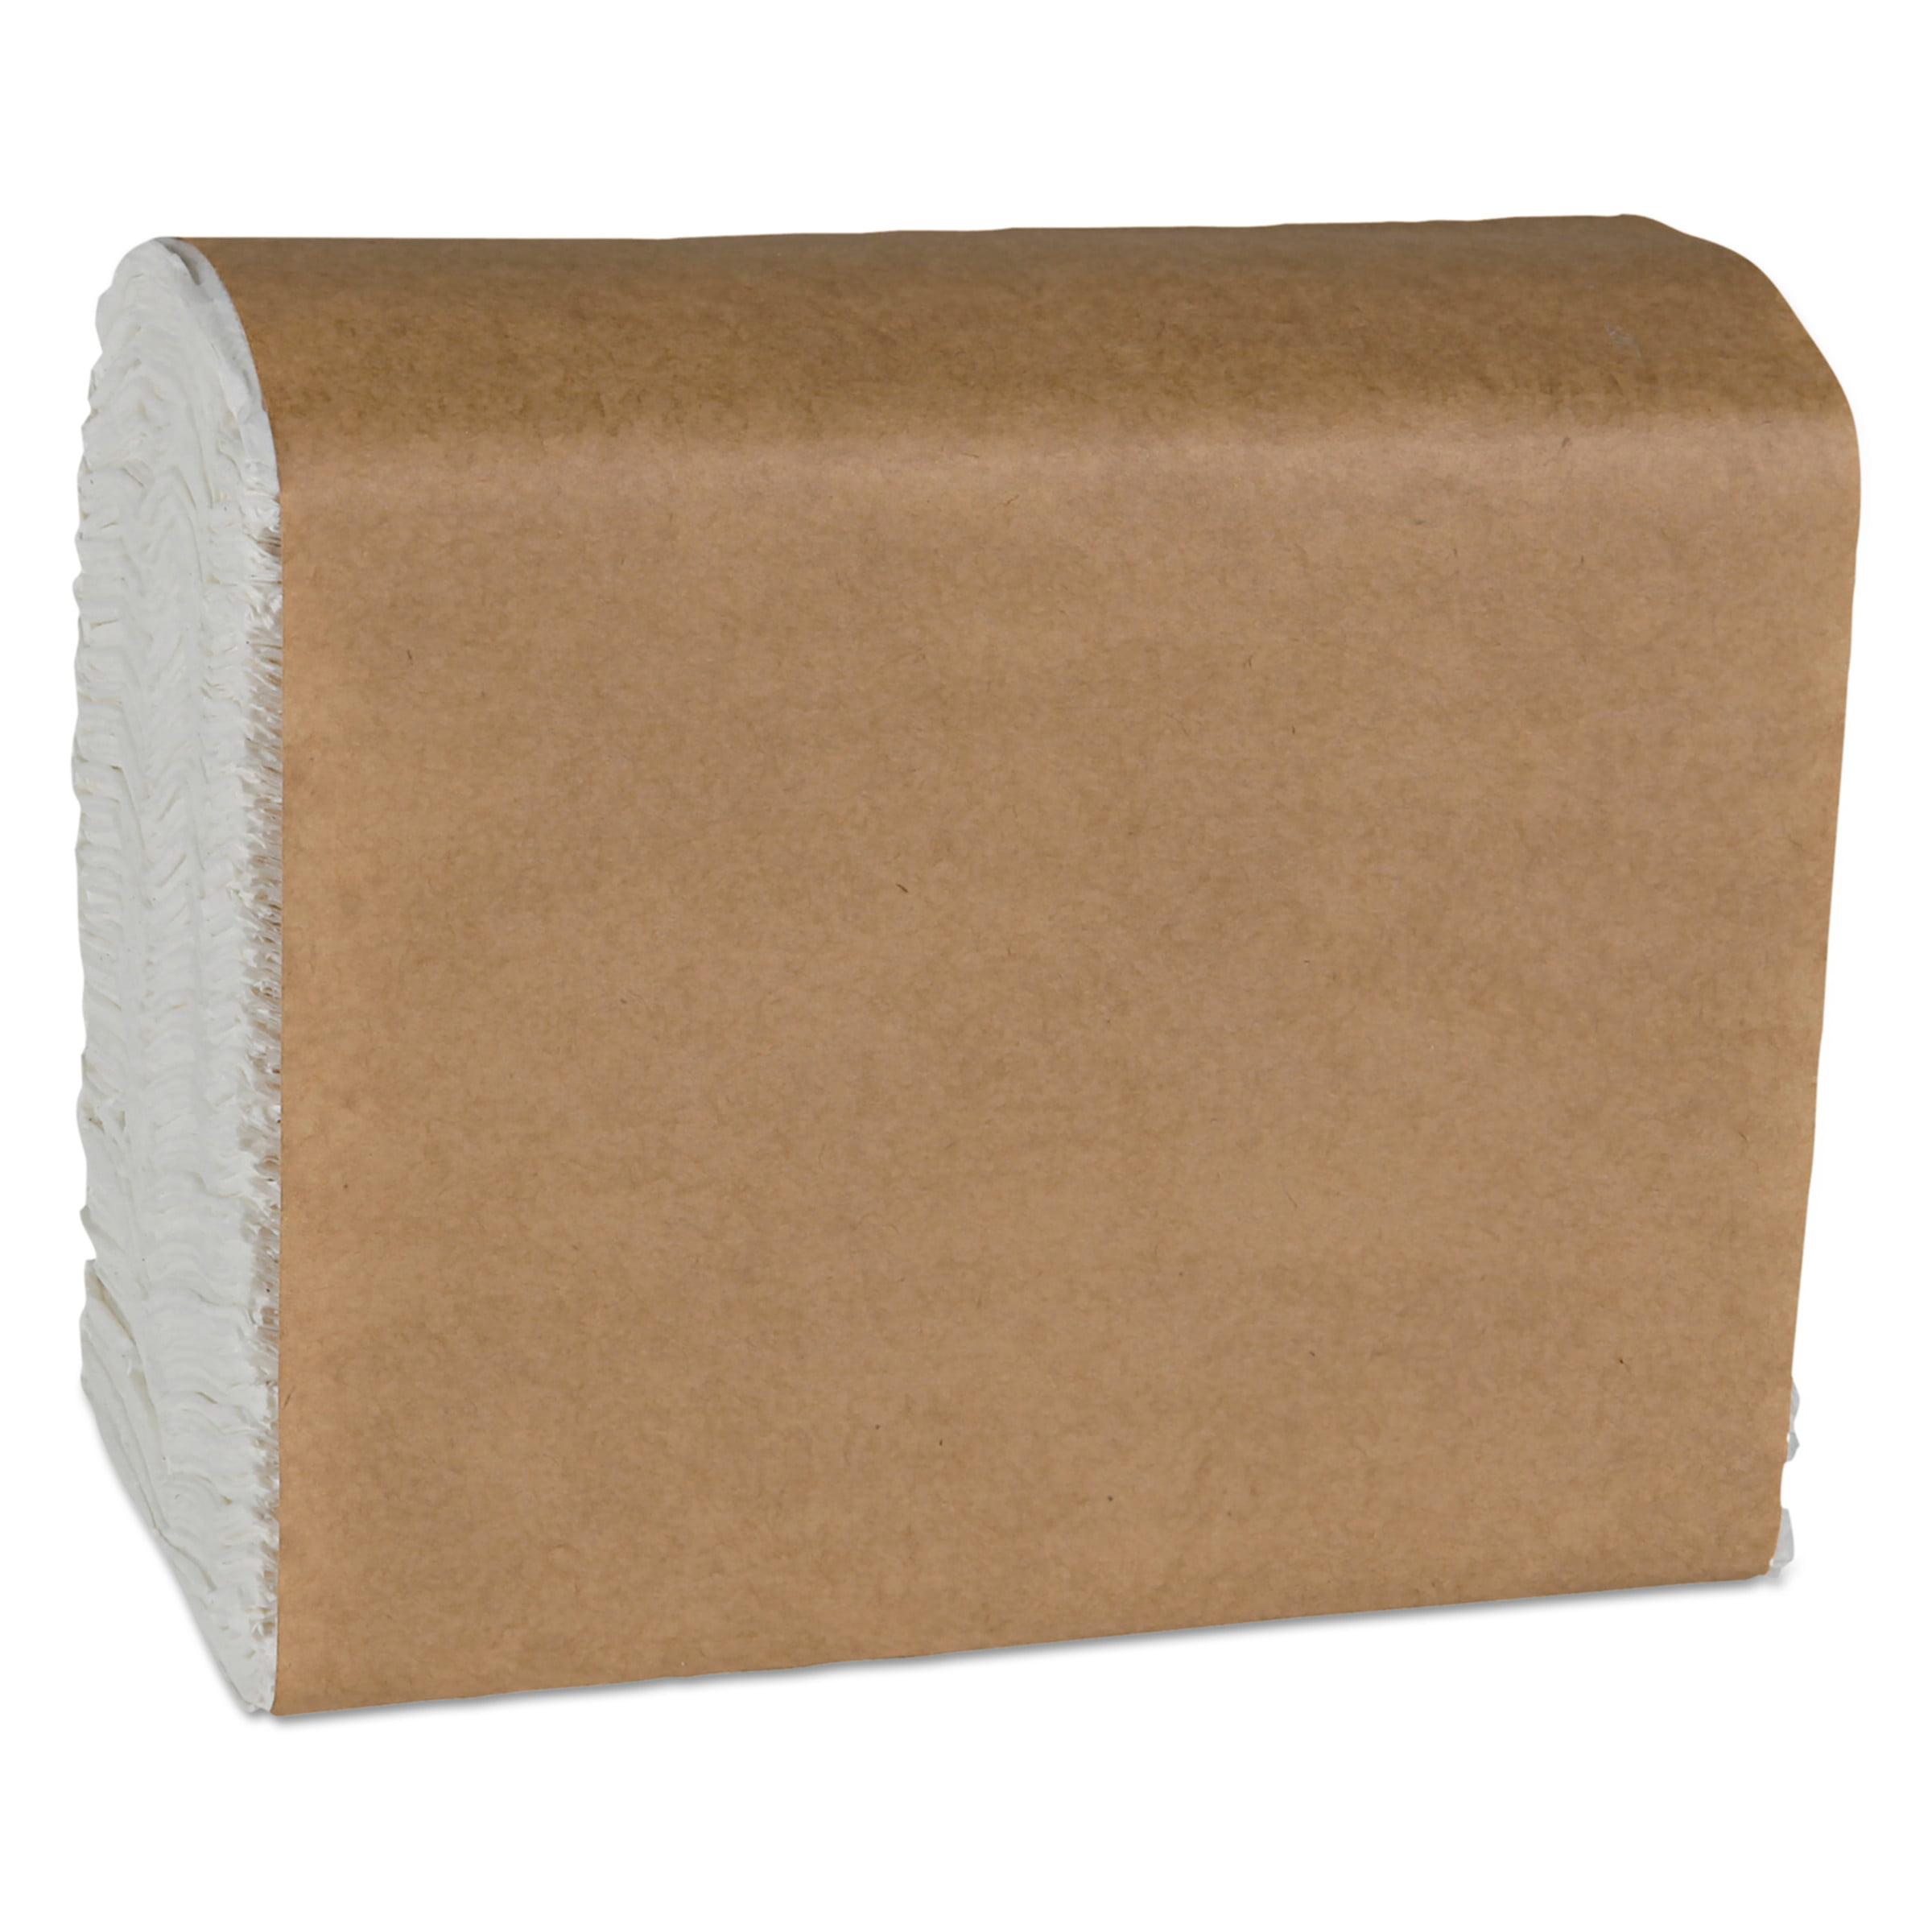 Case of 6 Packs White 8 2//5 x 6 1//2 1-Ply 875 per Pack Scott 98908 MegaCartridge Napkins